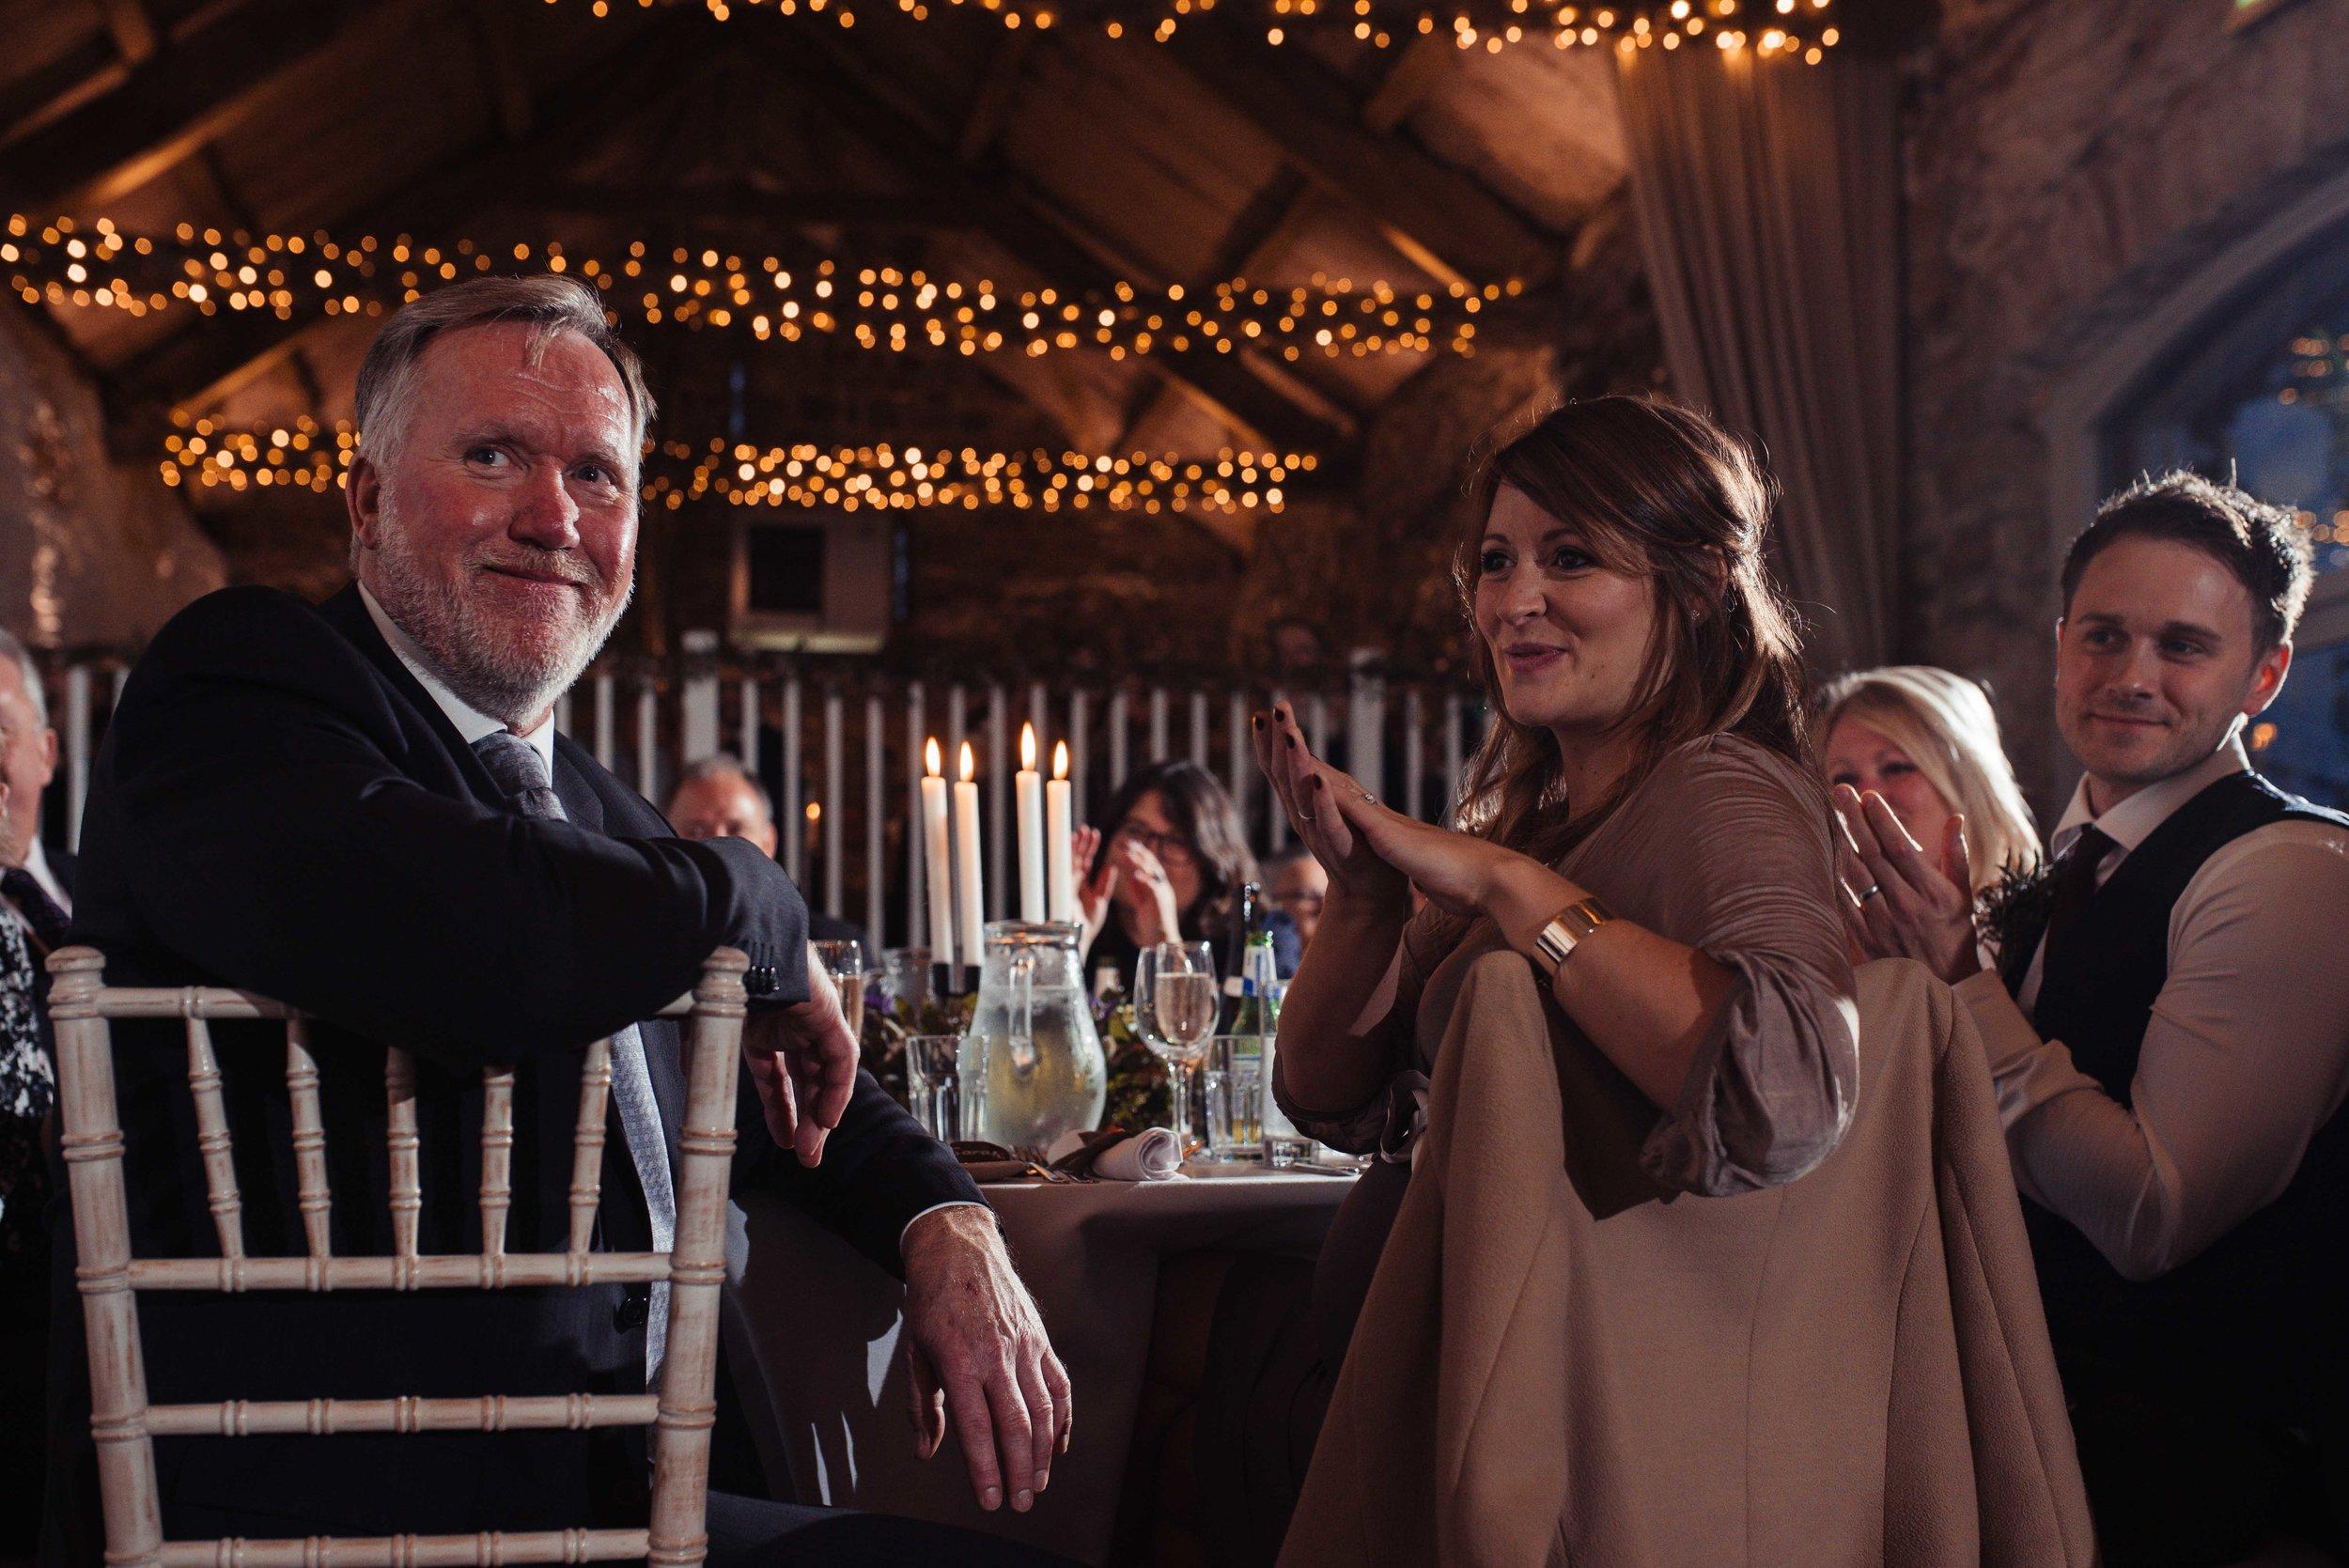 Askham-Hall-Wedding-Photography-75.jpg